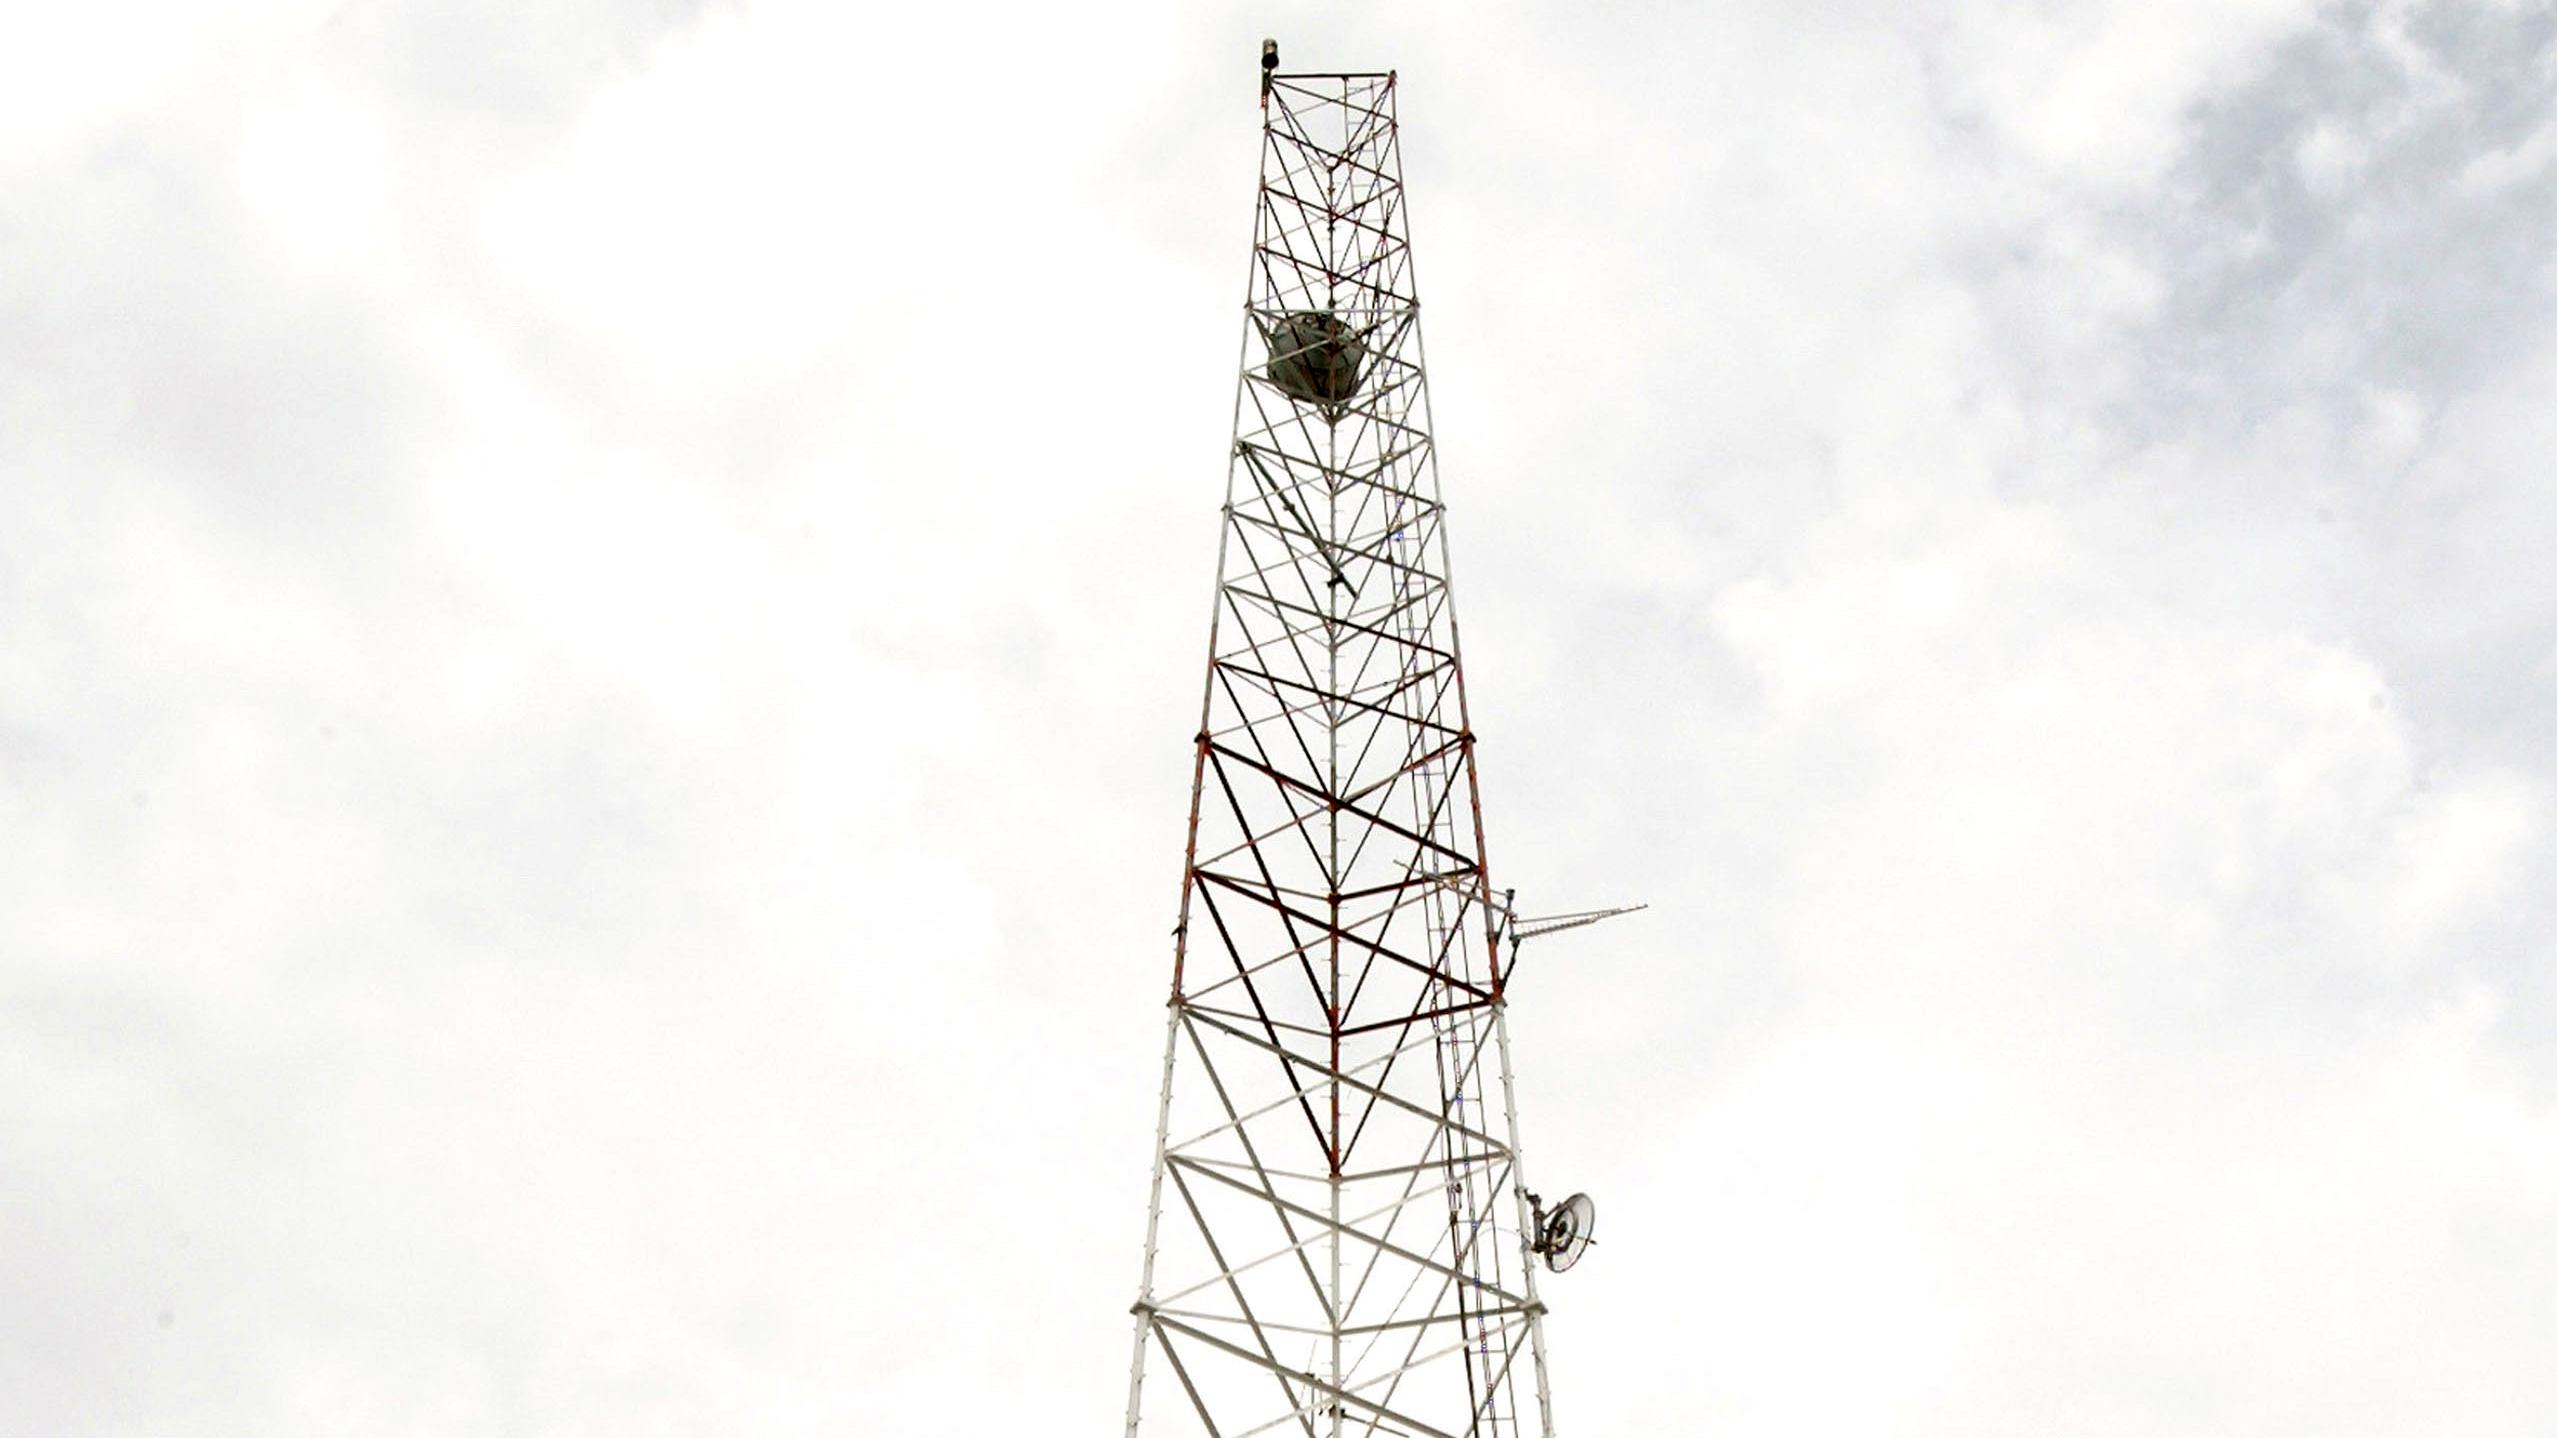 TOWER_1545321421866.jpg